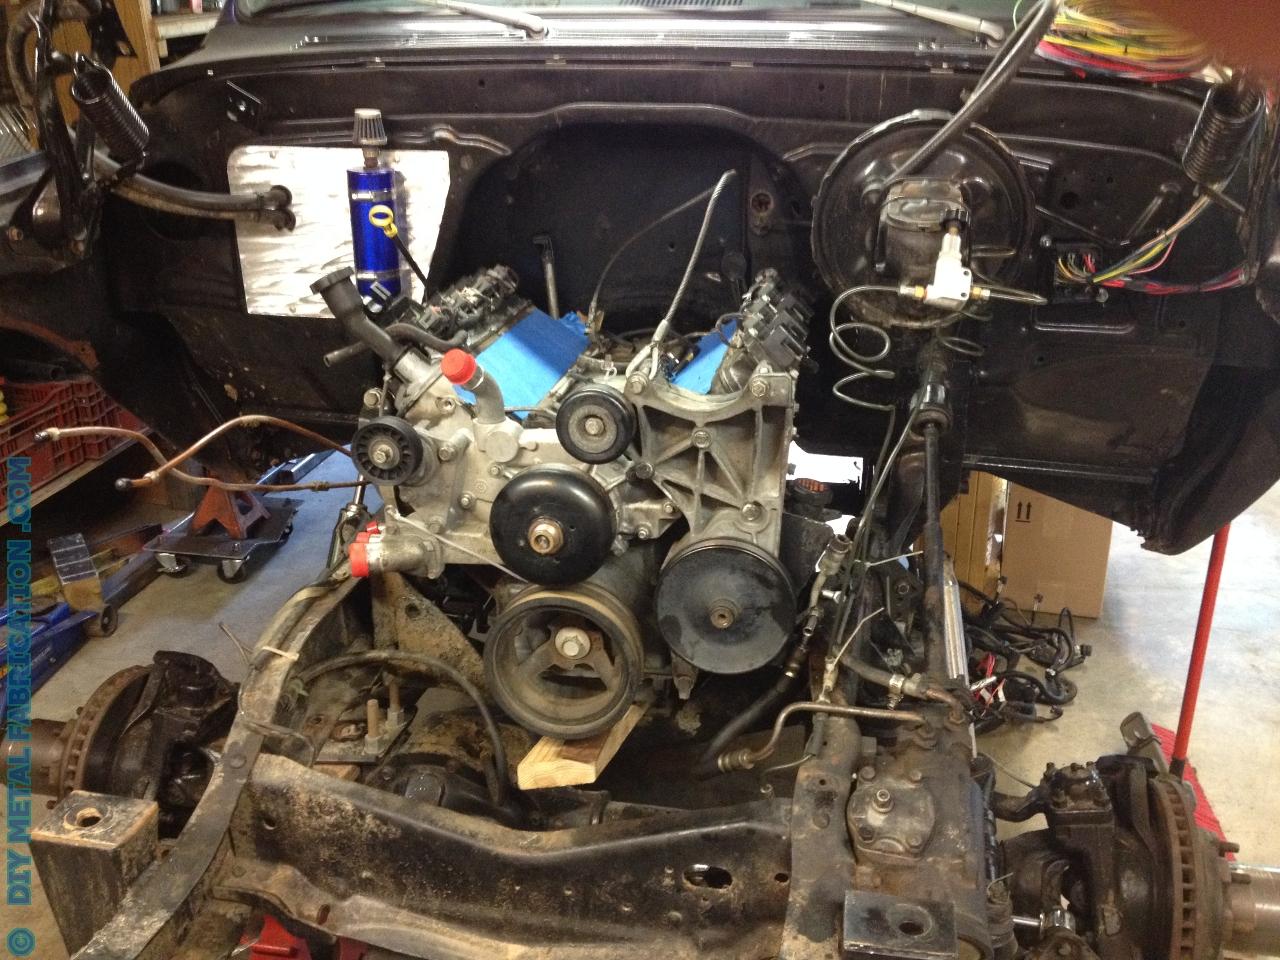 Diy Ls1 Wiring Harness 5 3 Ls Engine Swap Into Ol Blue 1971 Chevy Truck Part 2